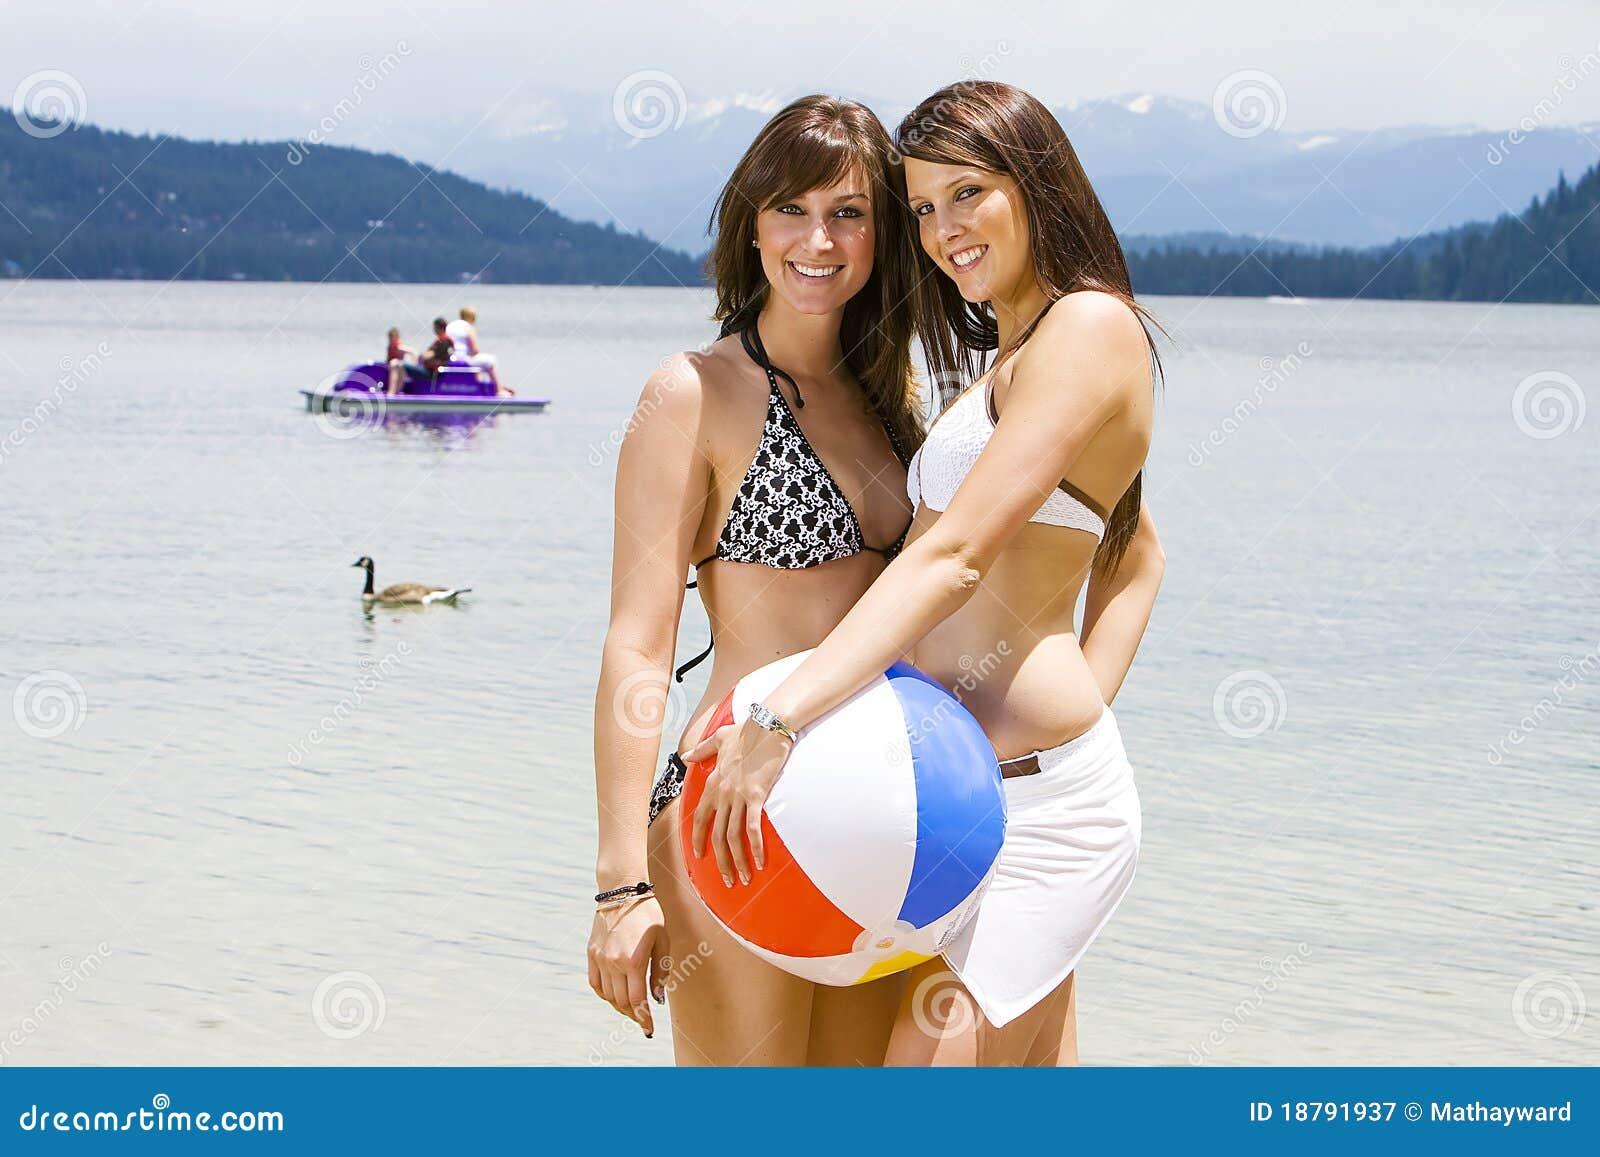 priveontvangs mooie vrouwen in bikini